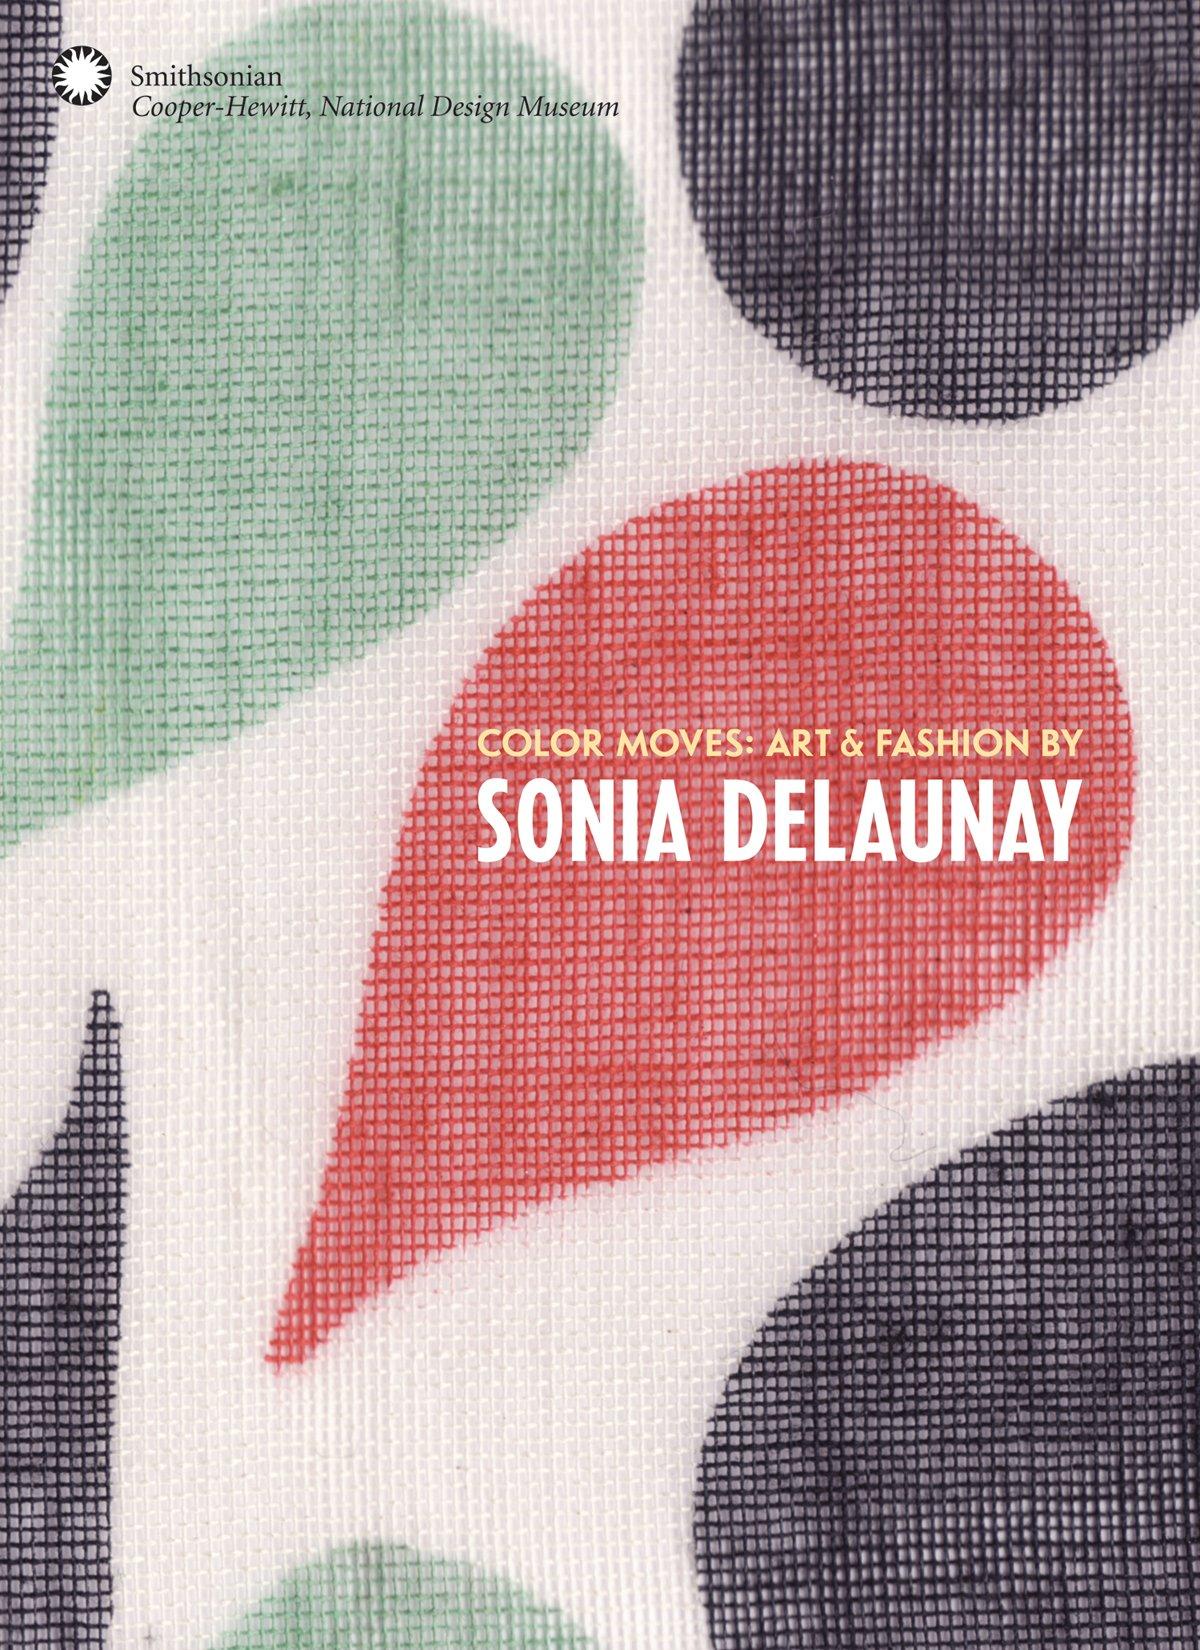 sonia delaunay art into fashion